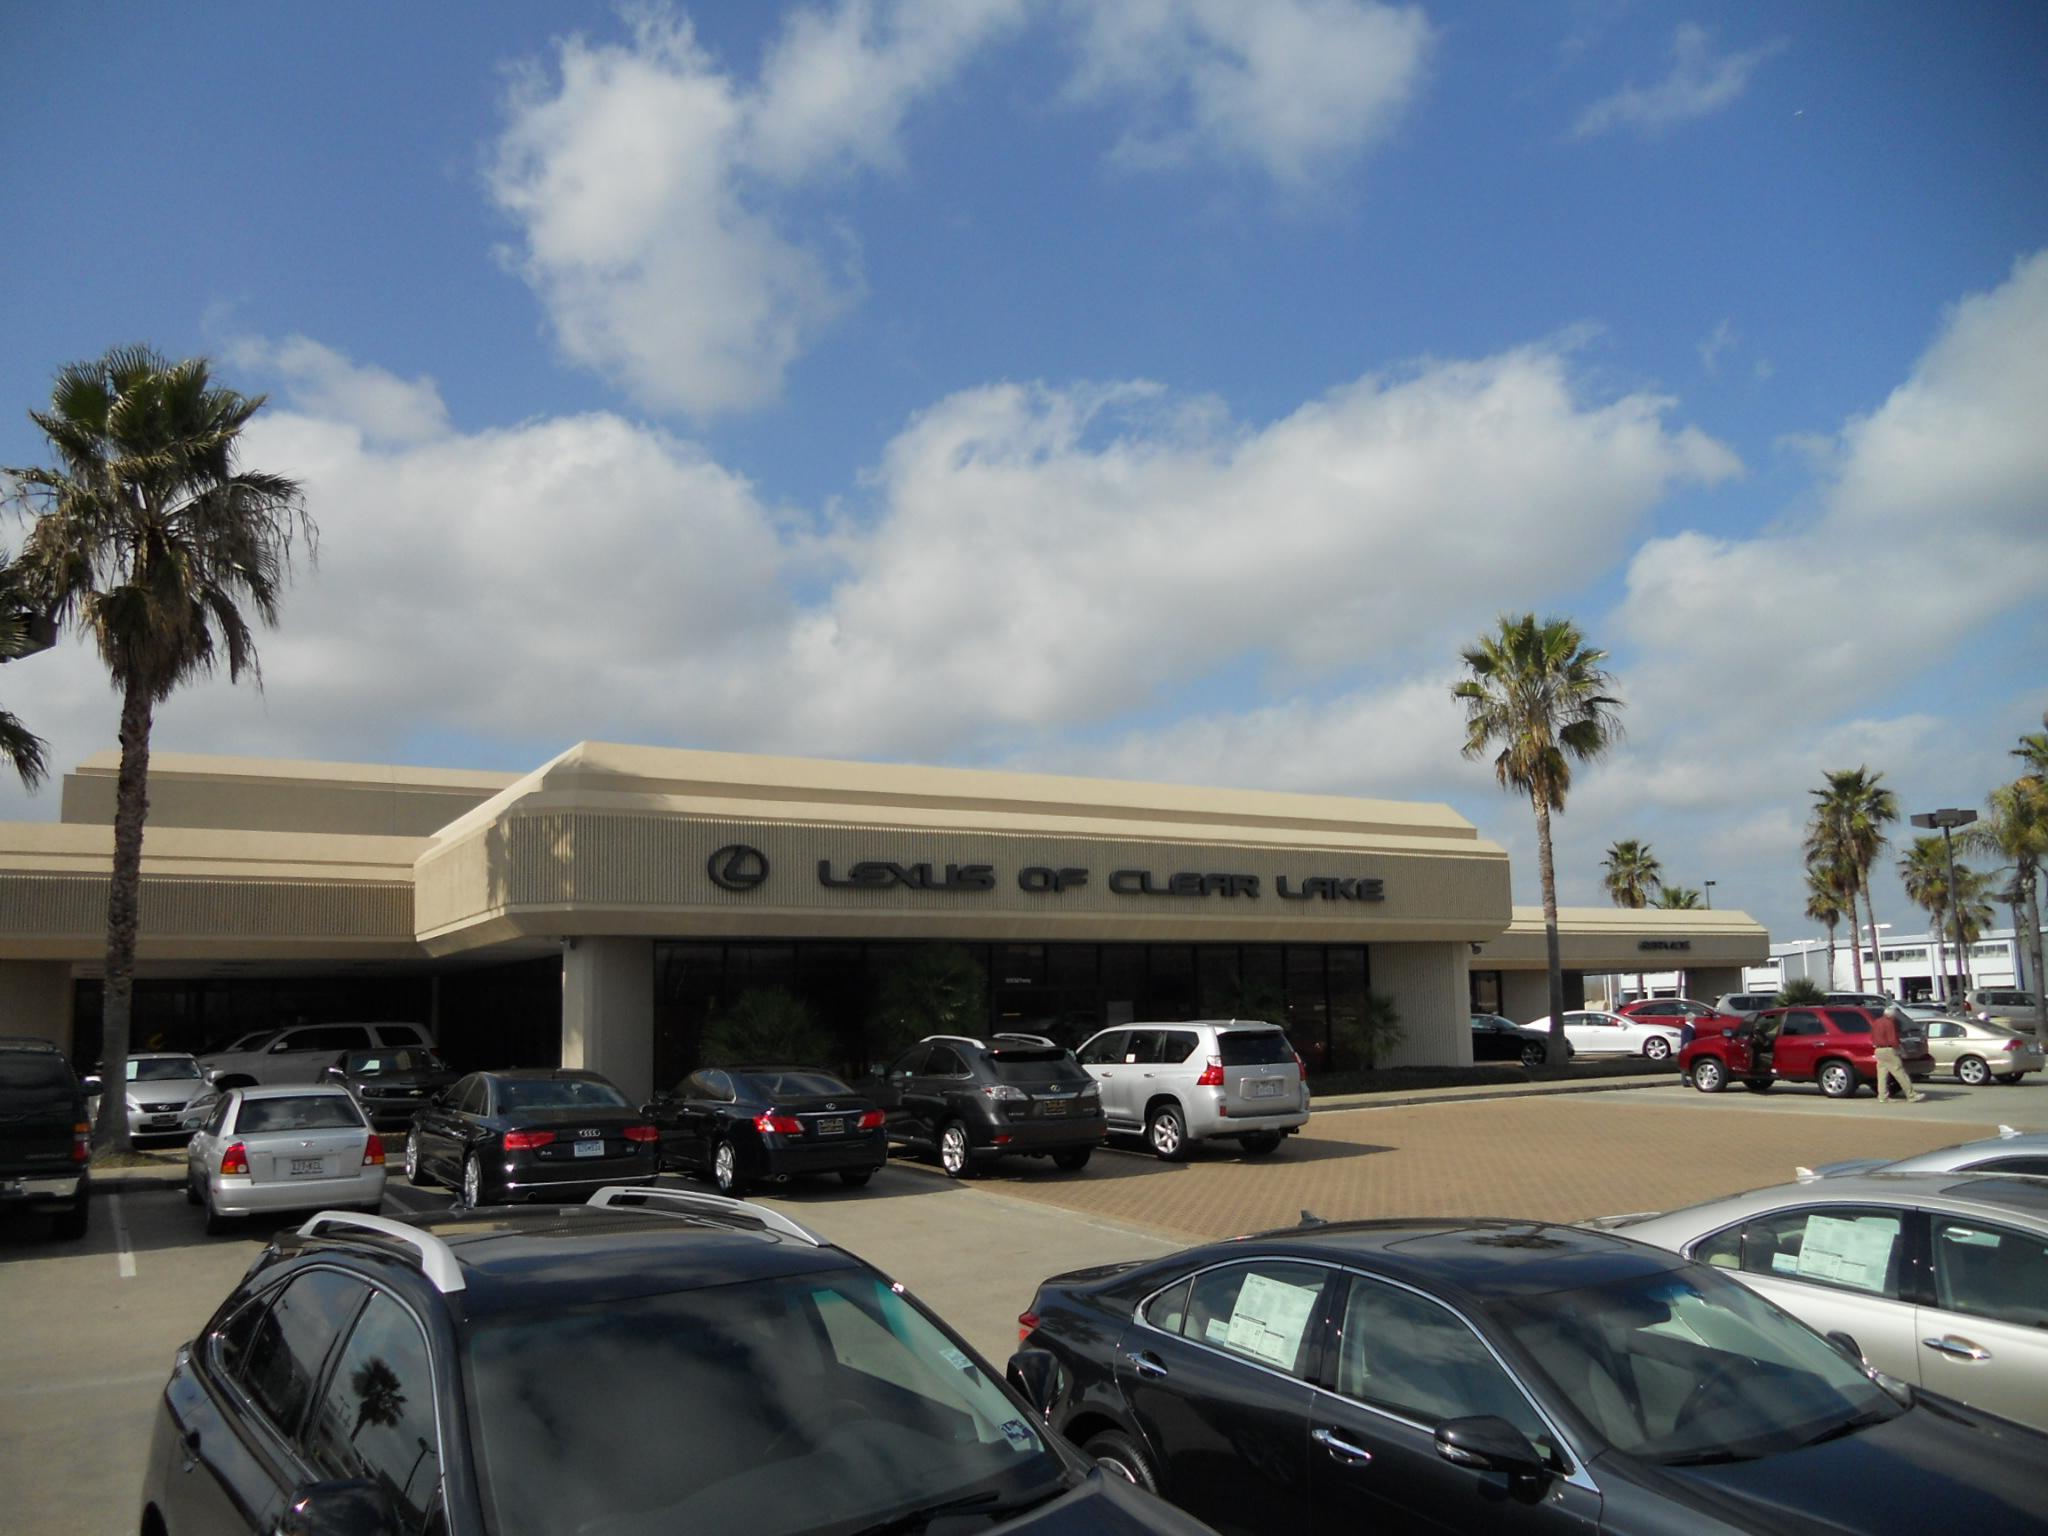 Lexus of Clear Lake Gulf Freeway Houston TX Auto Dealers